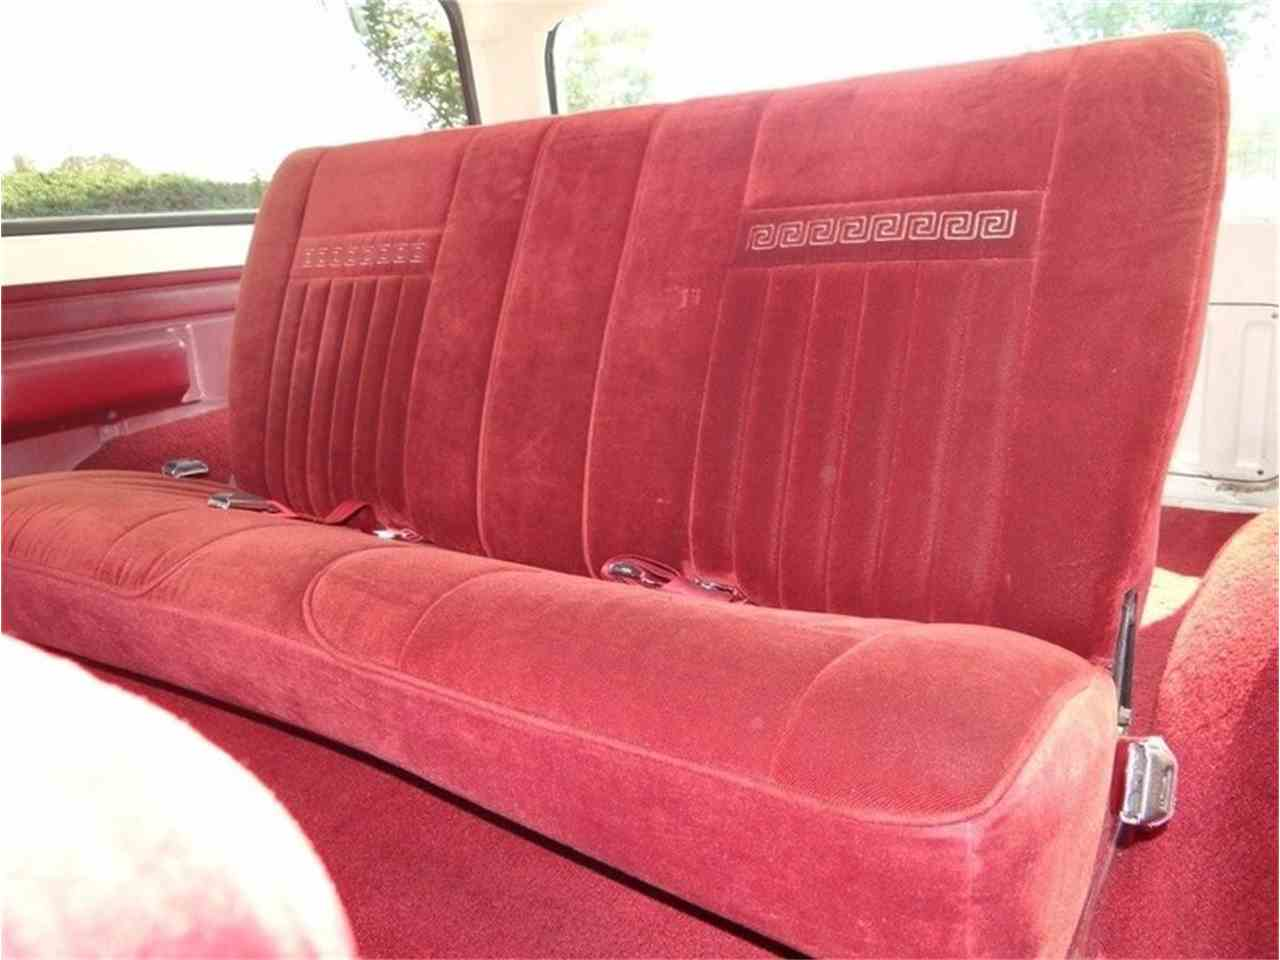 Large Picture of '87 Bronco located in Greensboro North Carolina - LVQS